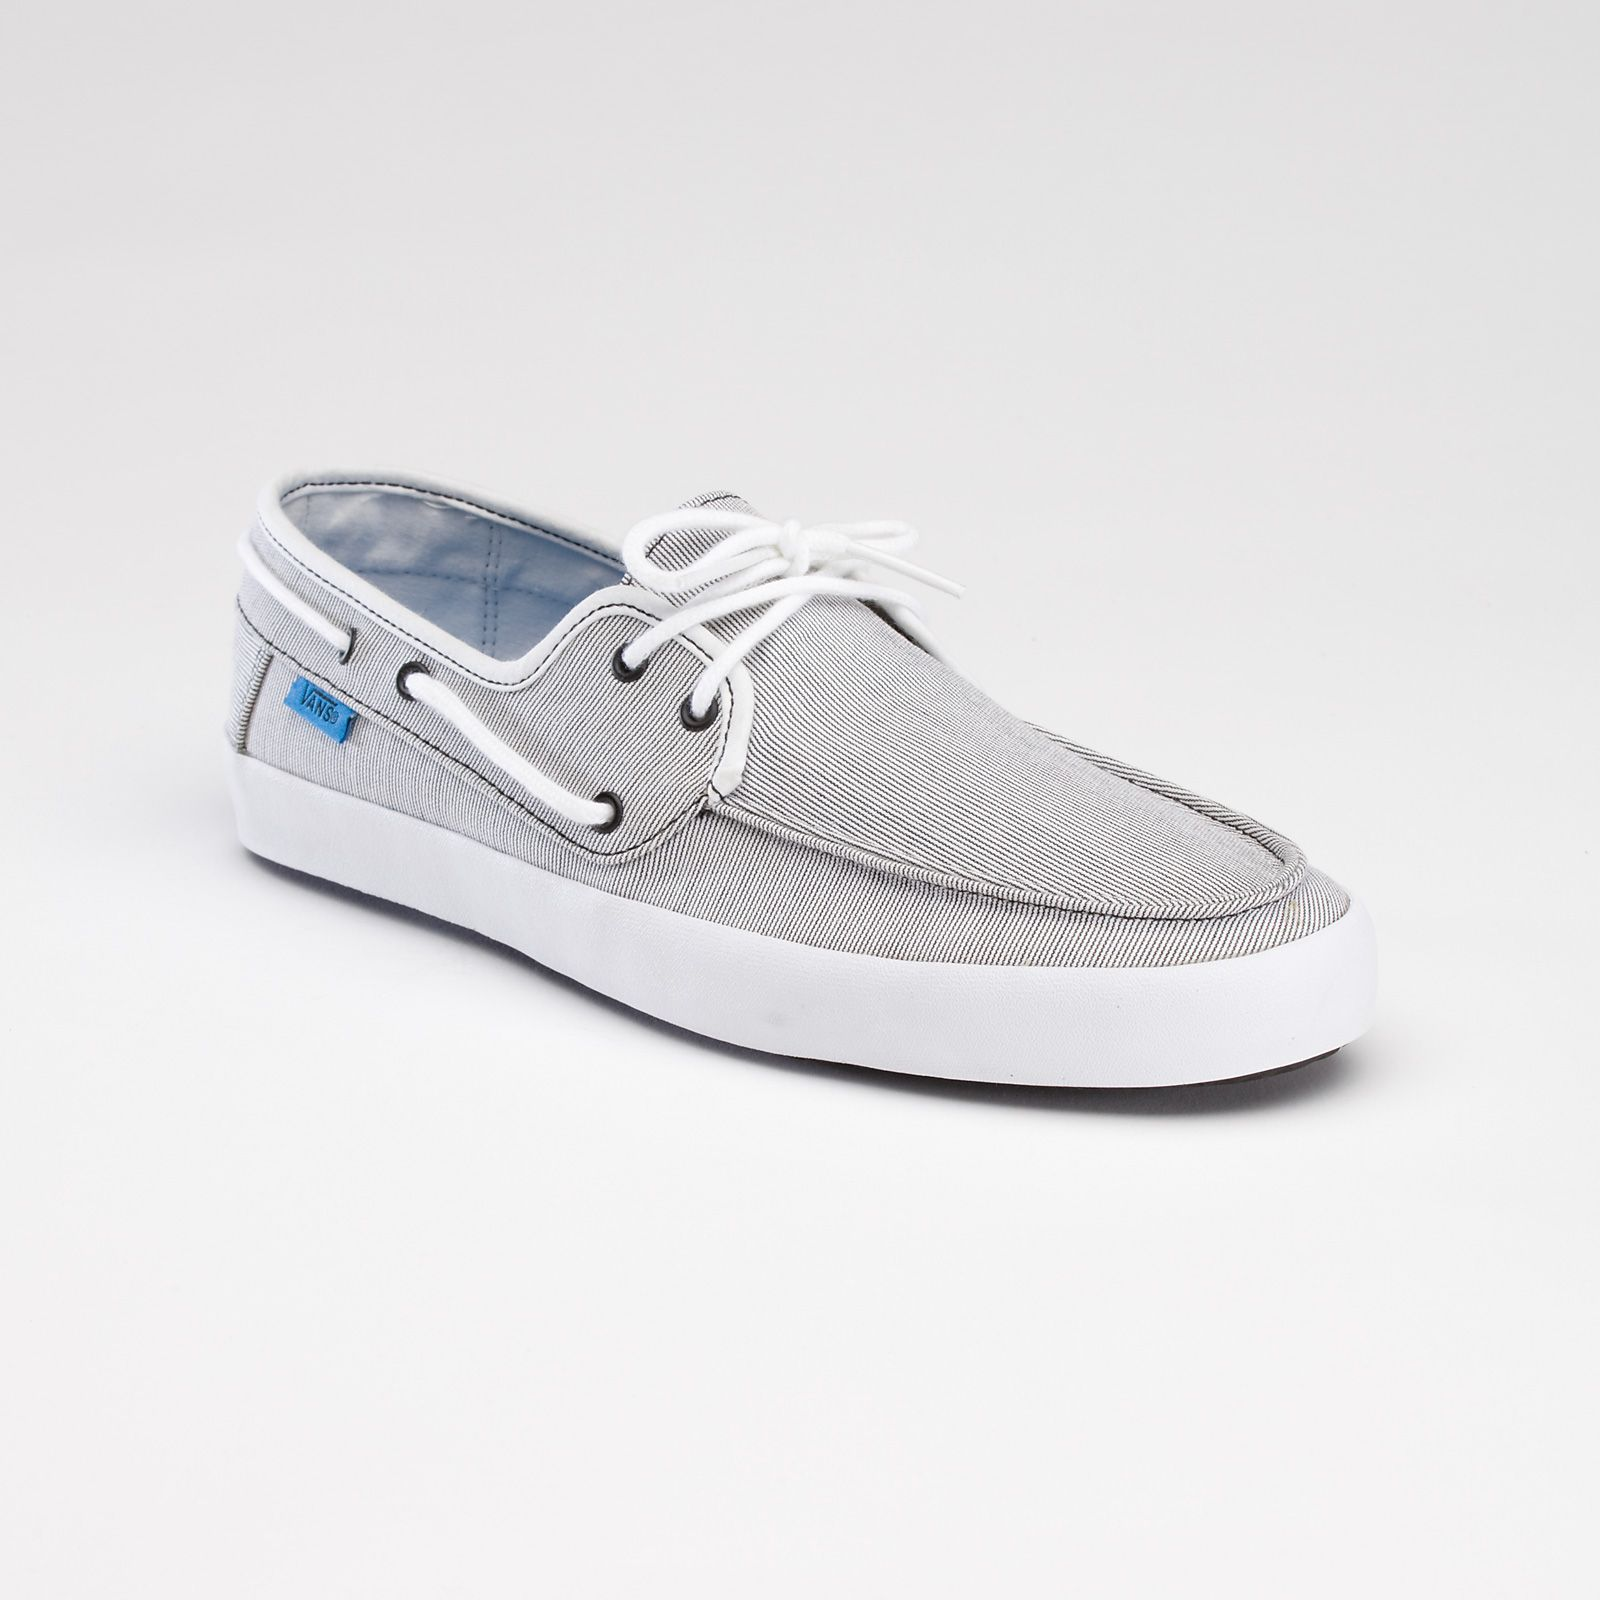 striped vans boat shoes.  364f70cf45c